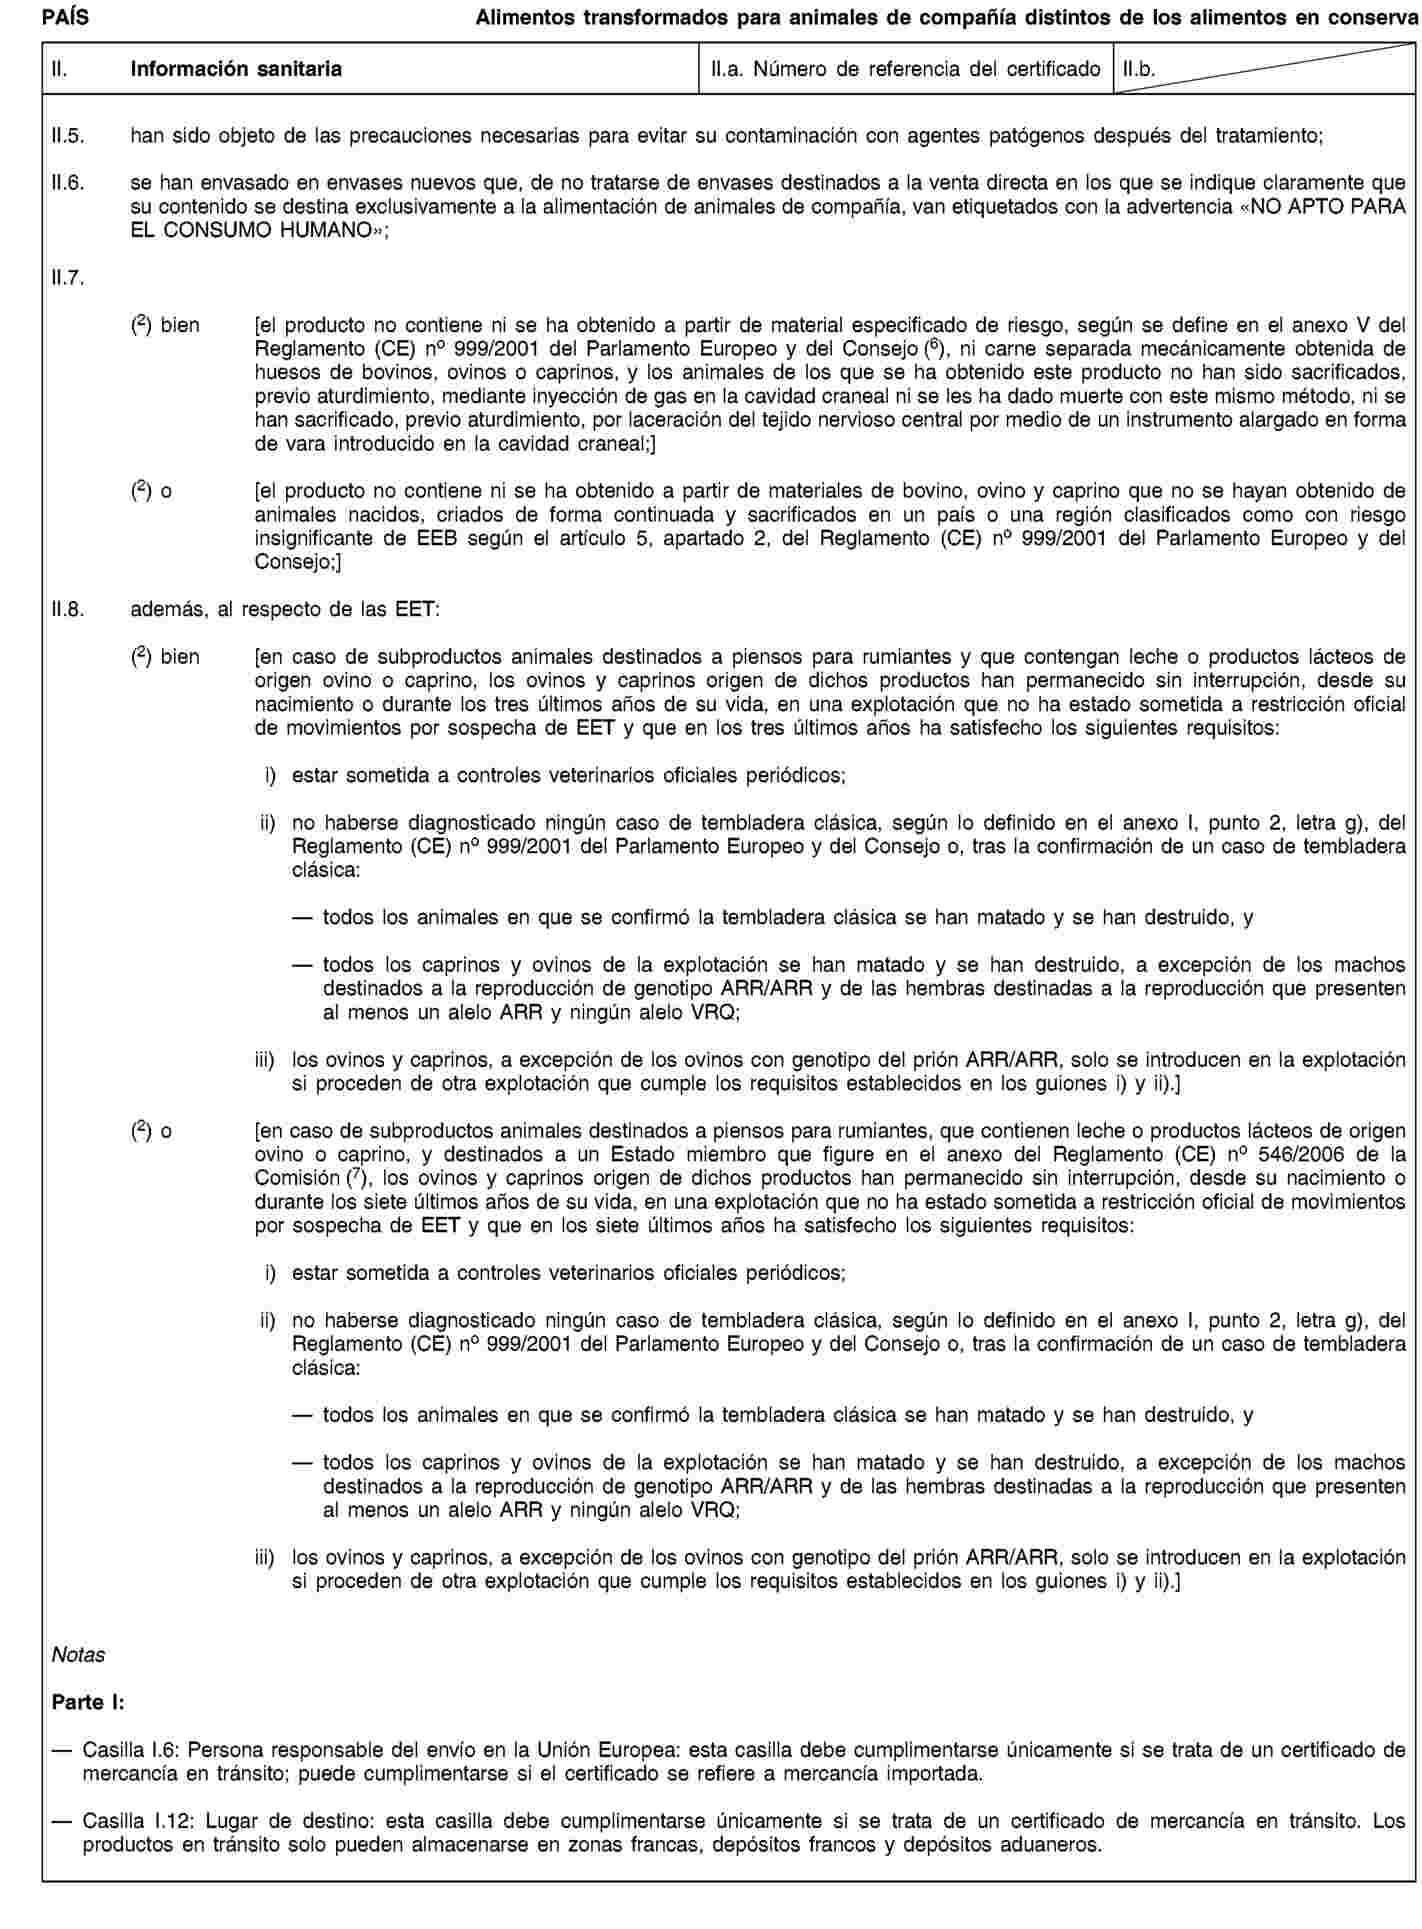 Imagen: https://eur-lex.europa.eu/resource.html?uri=uriserv:OJ.L_.2011.054.01.0001.01.SPA.xhtml.L_2011054ES.01014001.tif.jpg